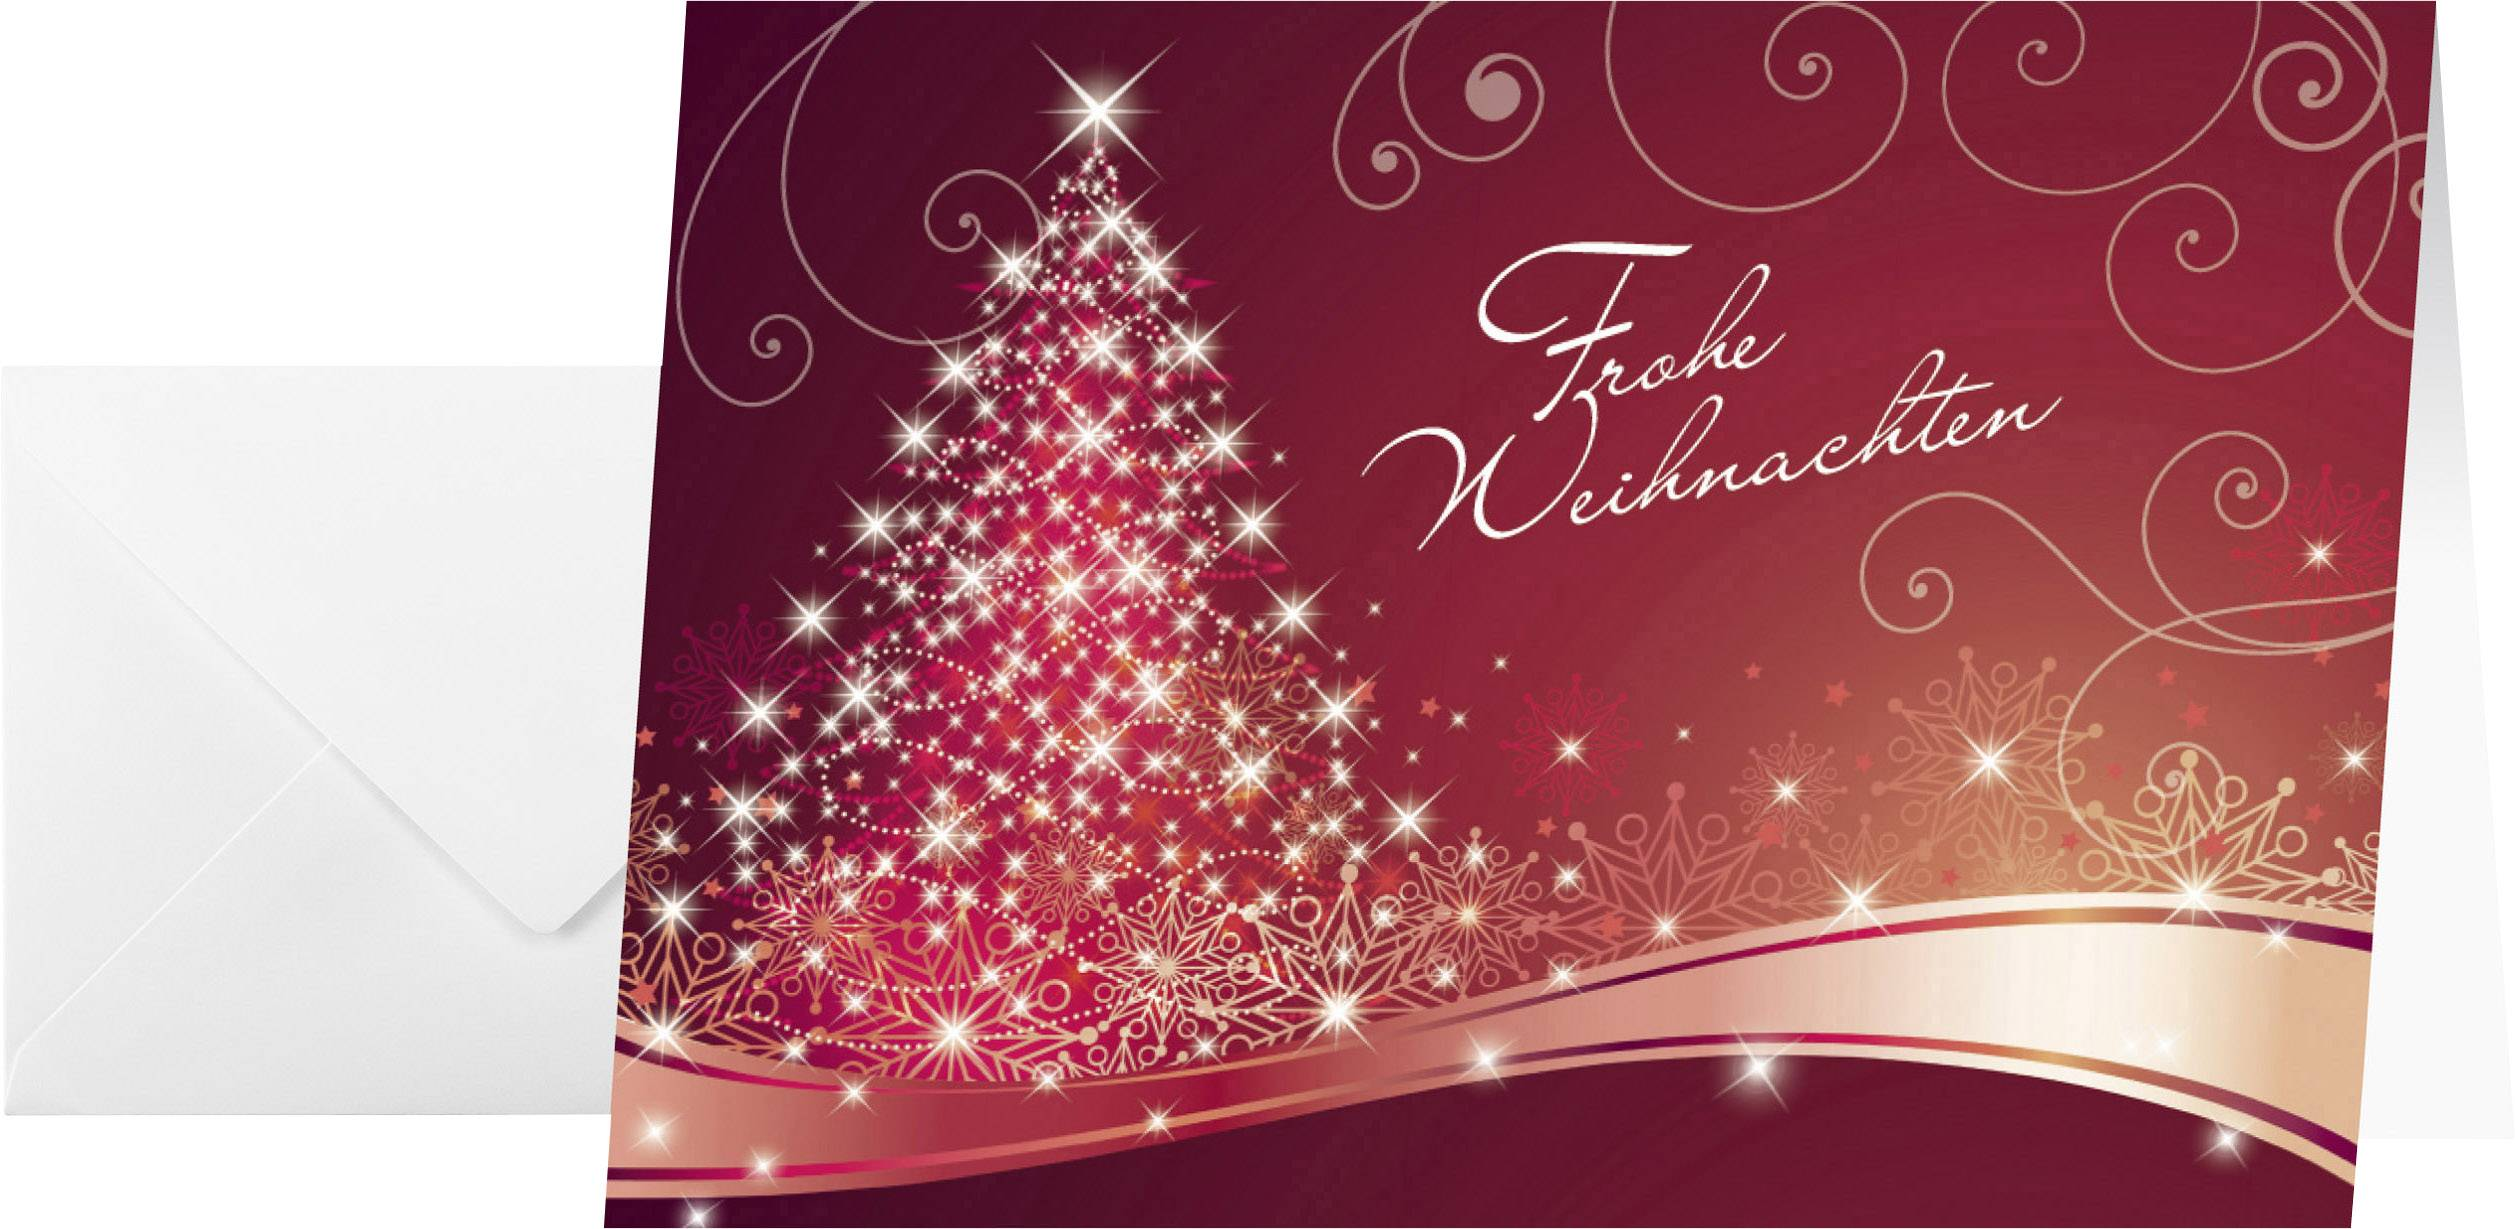 Weihnachtskarte Briefumschlag Sigel Ds019 Christmas Swing Din A6